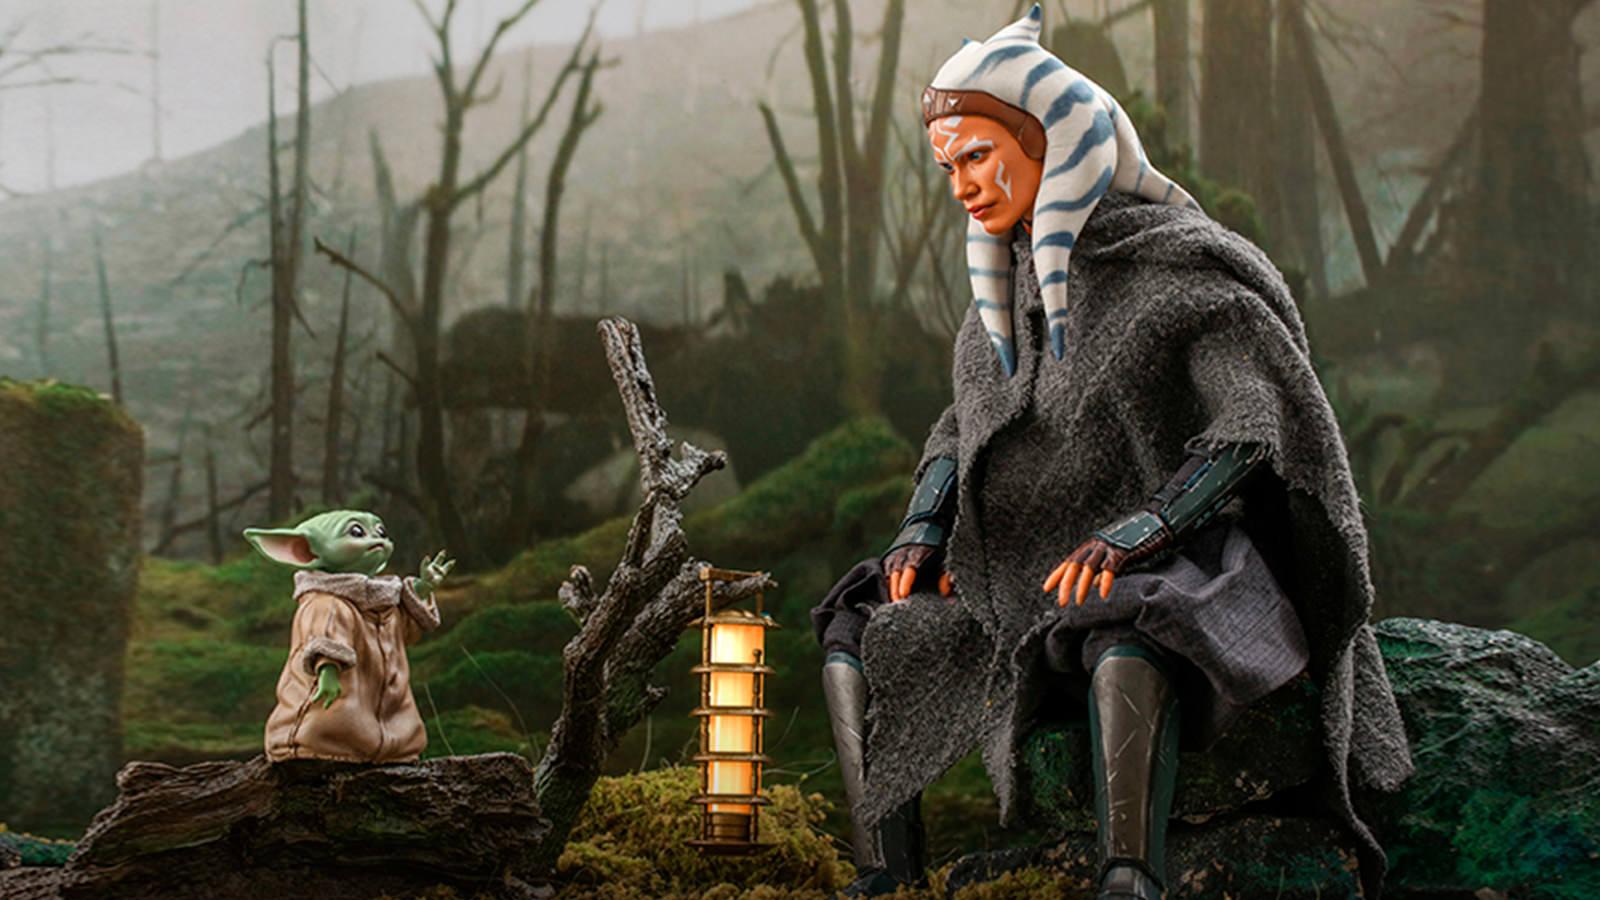 Hot Toys Star Wars The Mandalorian Ahsoka Tano & Grogu 1/6th Scale Collectible Set